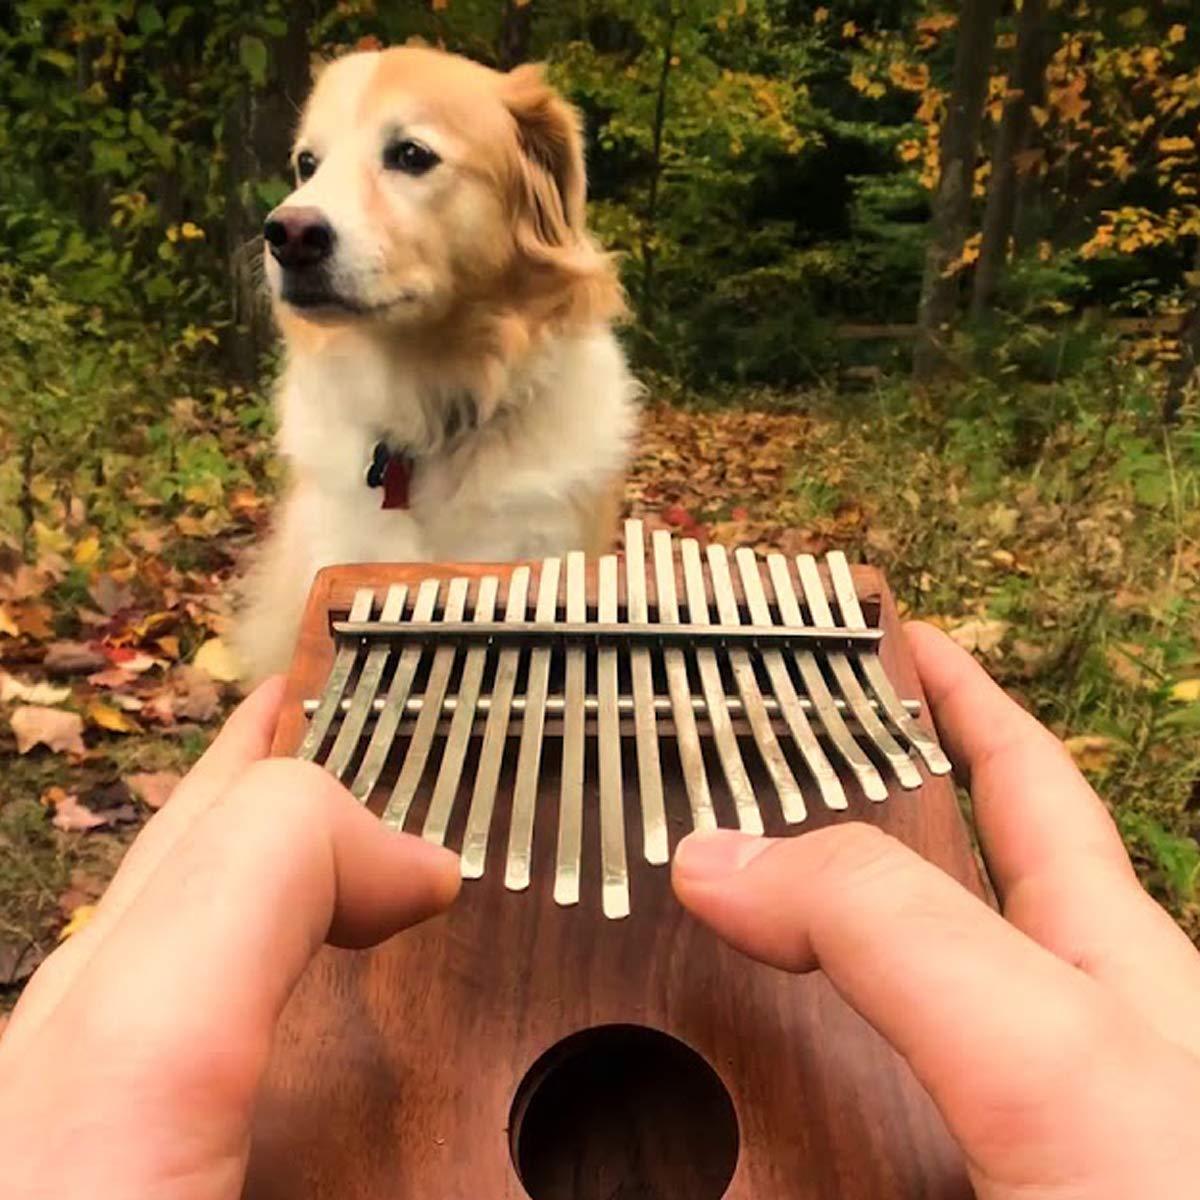 Elejolie Kalimba 17 Keys Thumb Piano Portable Beginner Piano Entry Finger Piano Mahogany Wood Best Gift for You by Elejolie (Image #6)